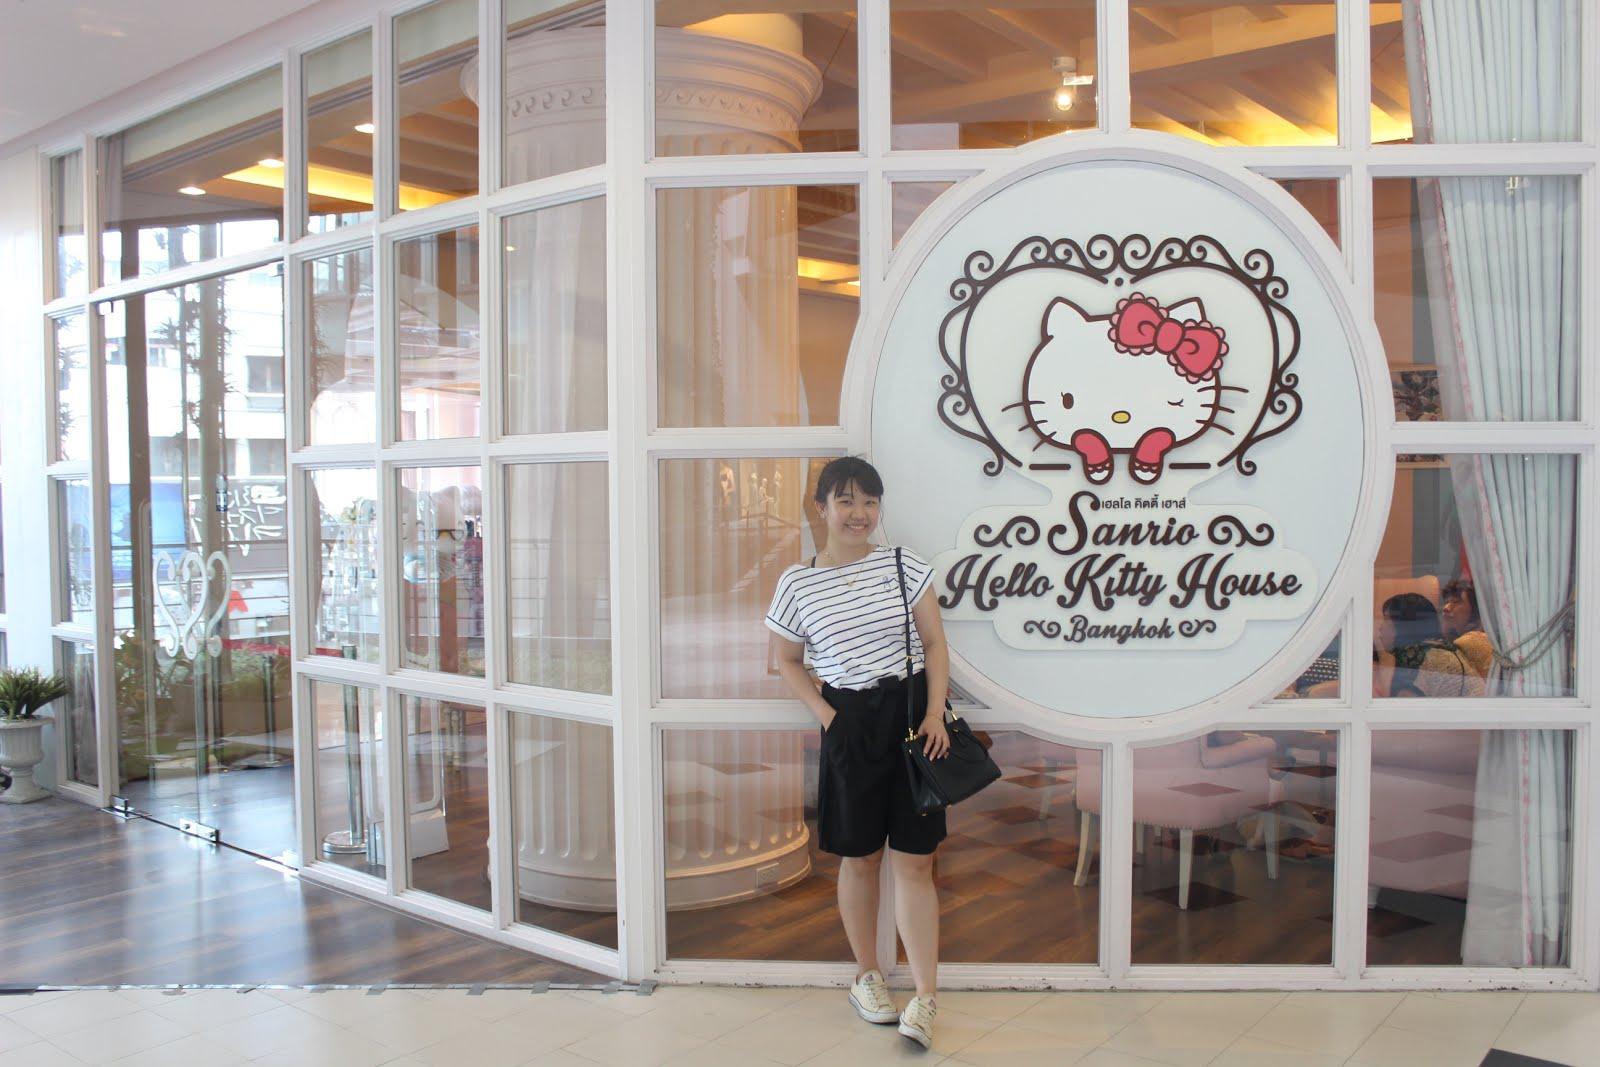 Thailand . Bangkok . ℓovε ♪ ♩ ♫ ♬